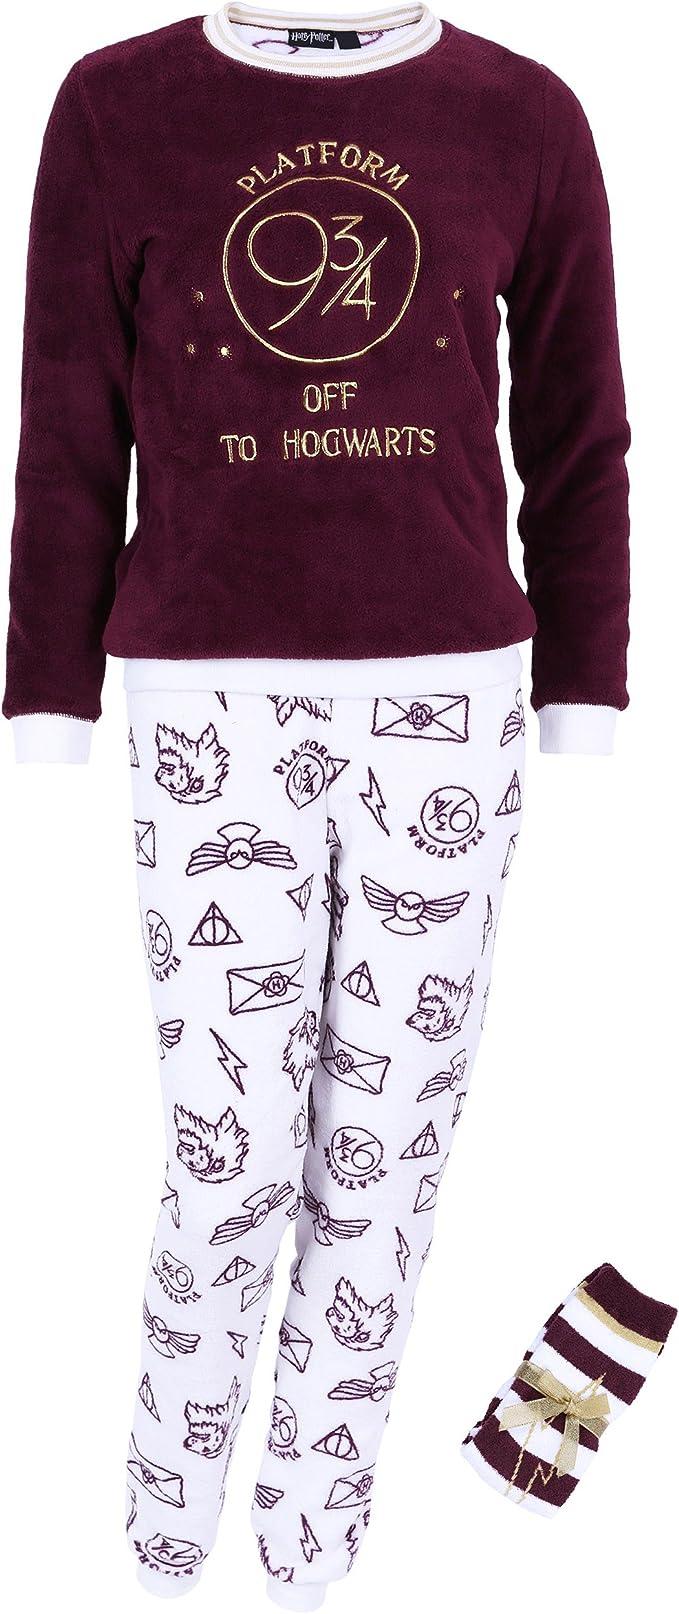 Harry Potter - Hogwarts - Pijama - para mujer - Small: Amazon.es ...